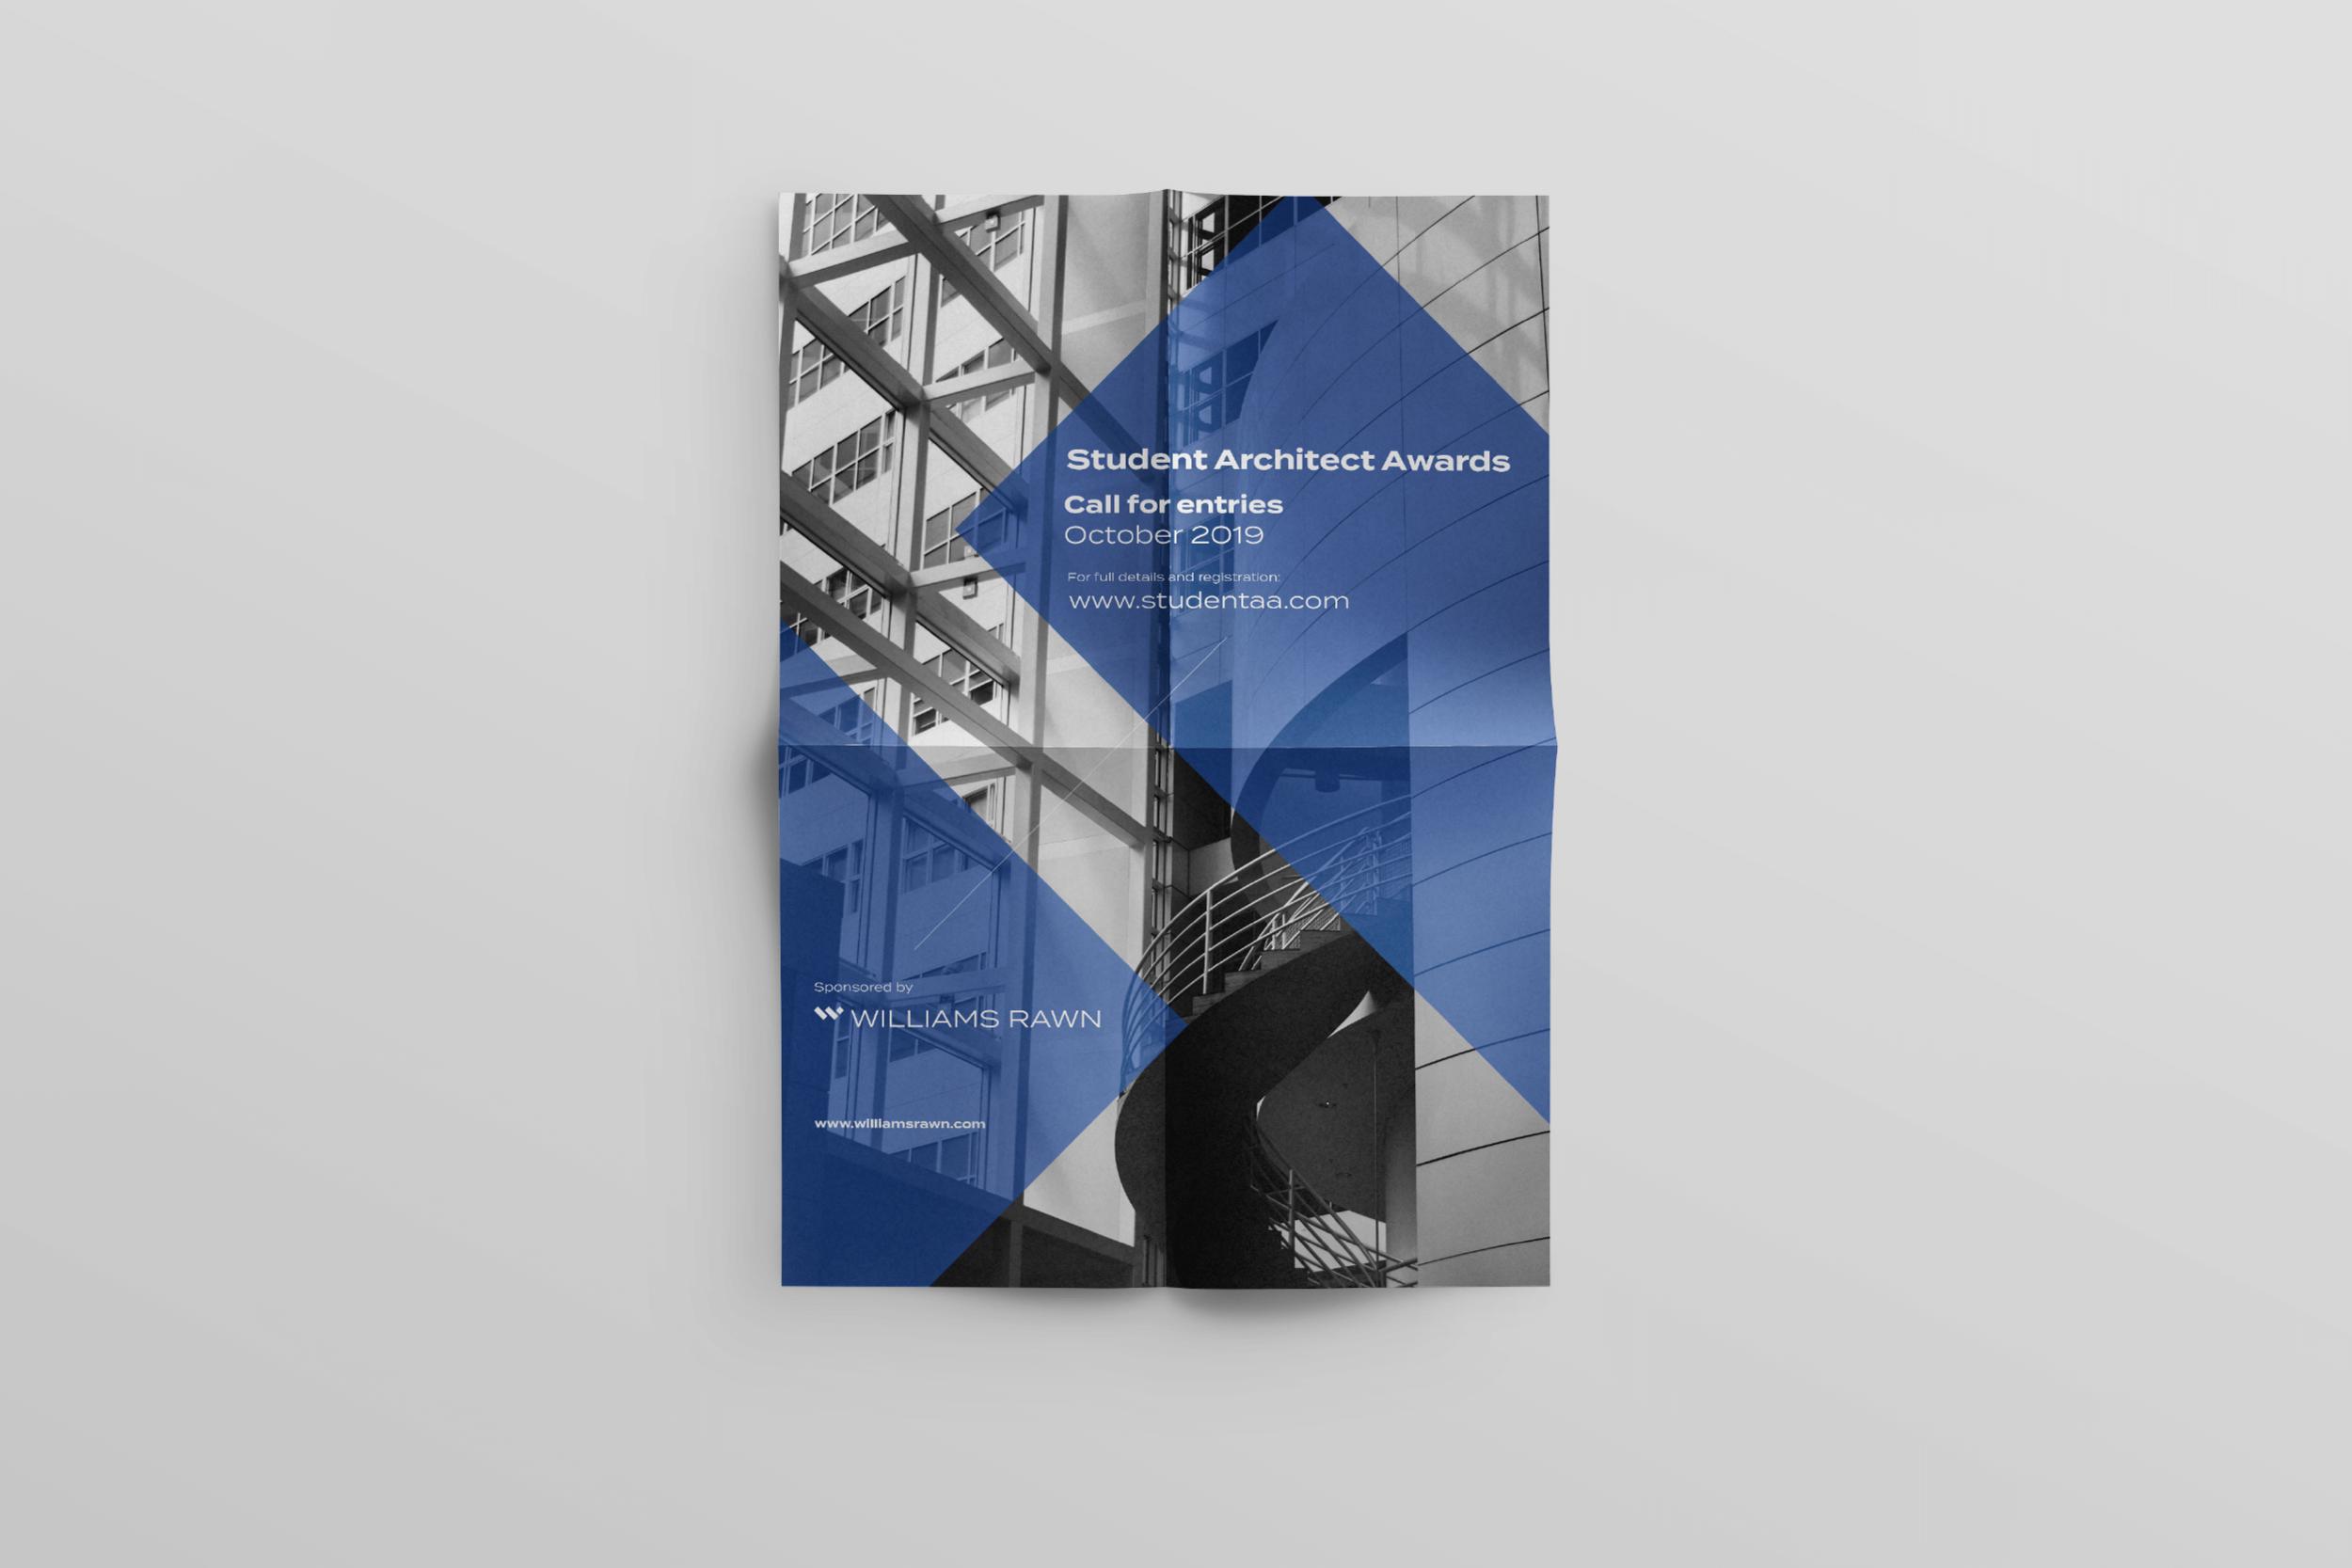 Sponsored poster for Student Architect Awards